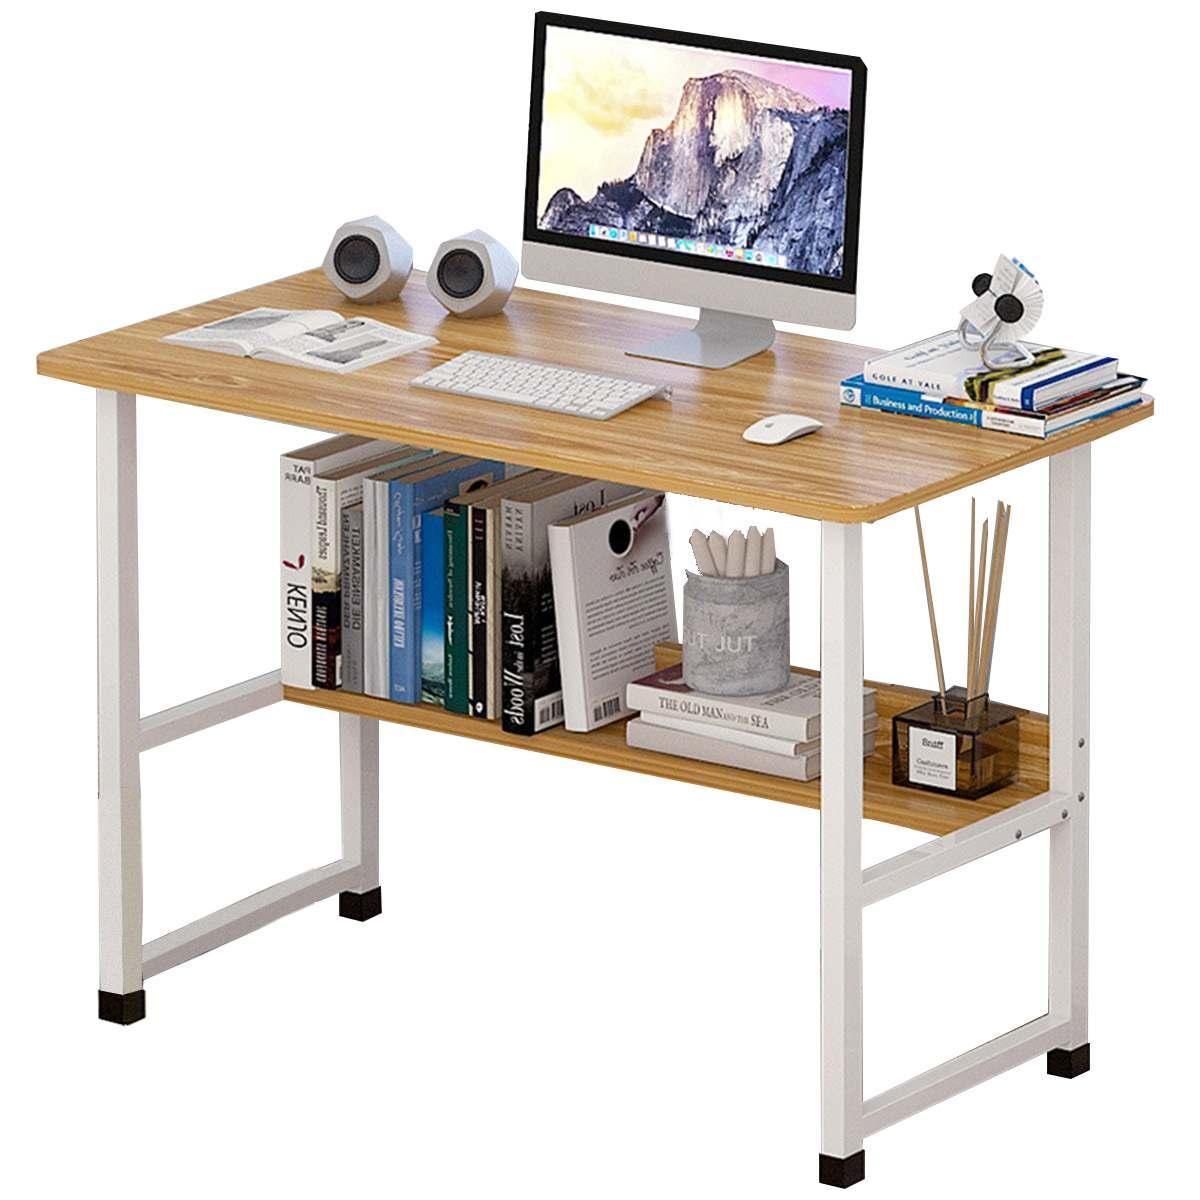 Computer Desk Laptop Desk with Shelves Home Office Computer Desk PC Gaming Table Workstation Study Writing Desk Modern